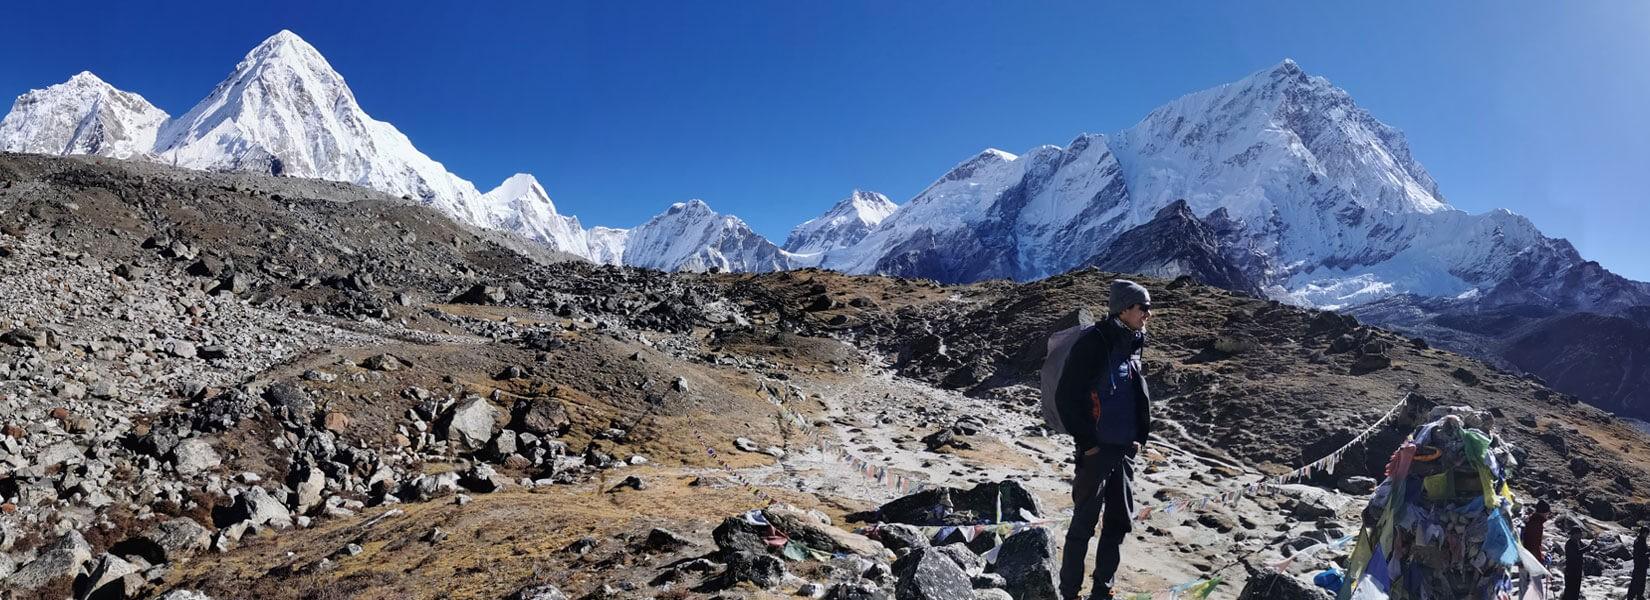 Everest Base Camp Trekking Alone